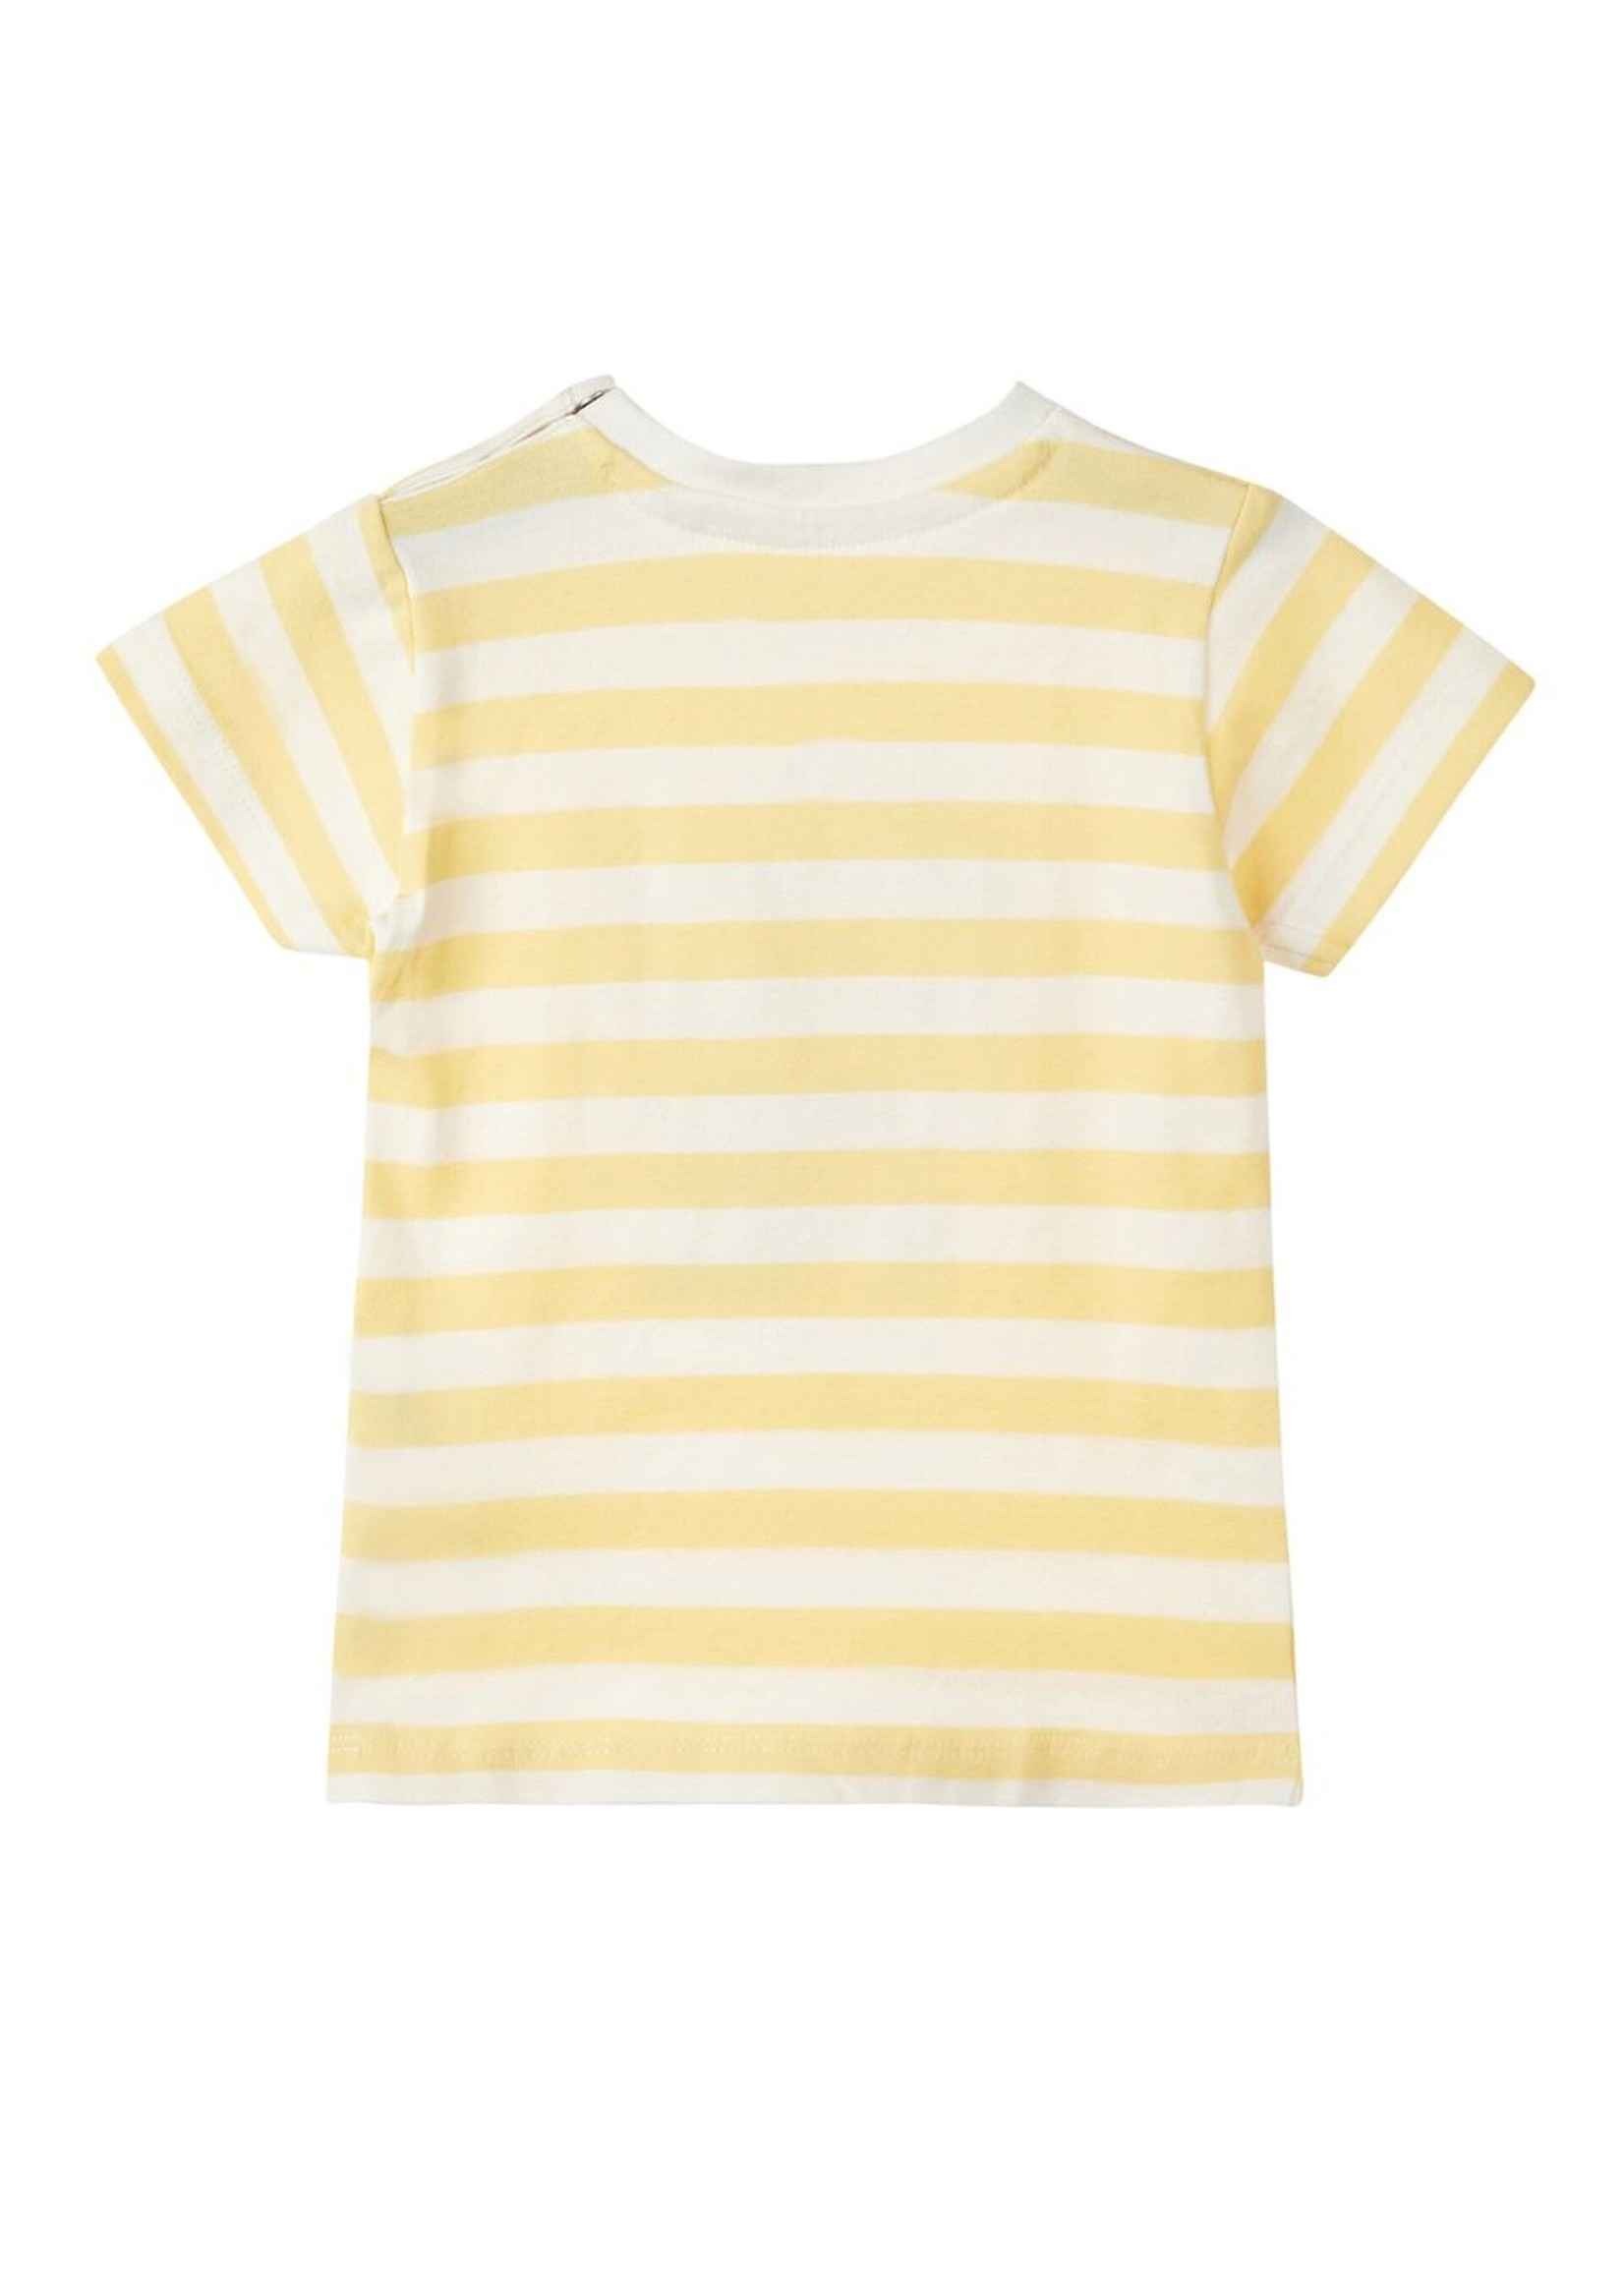 Name it T-shirt maat 68